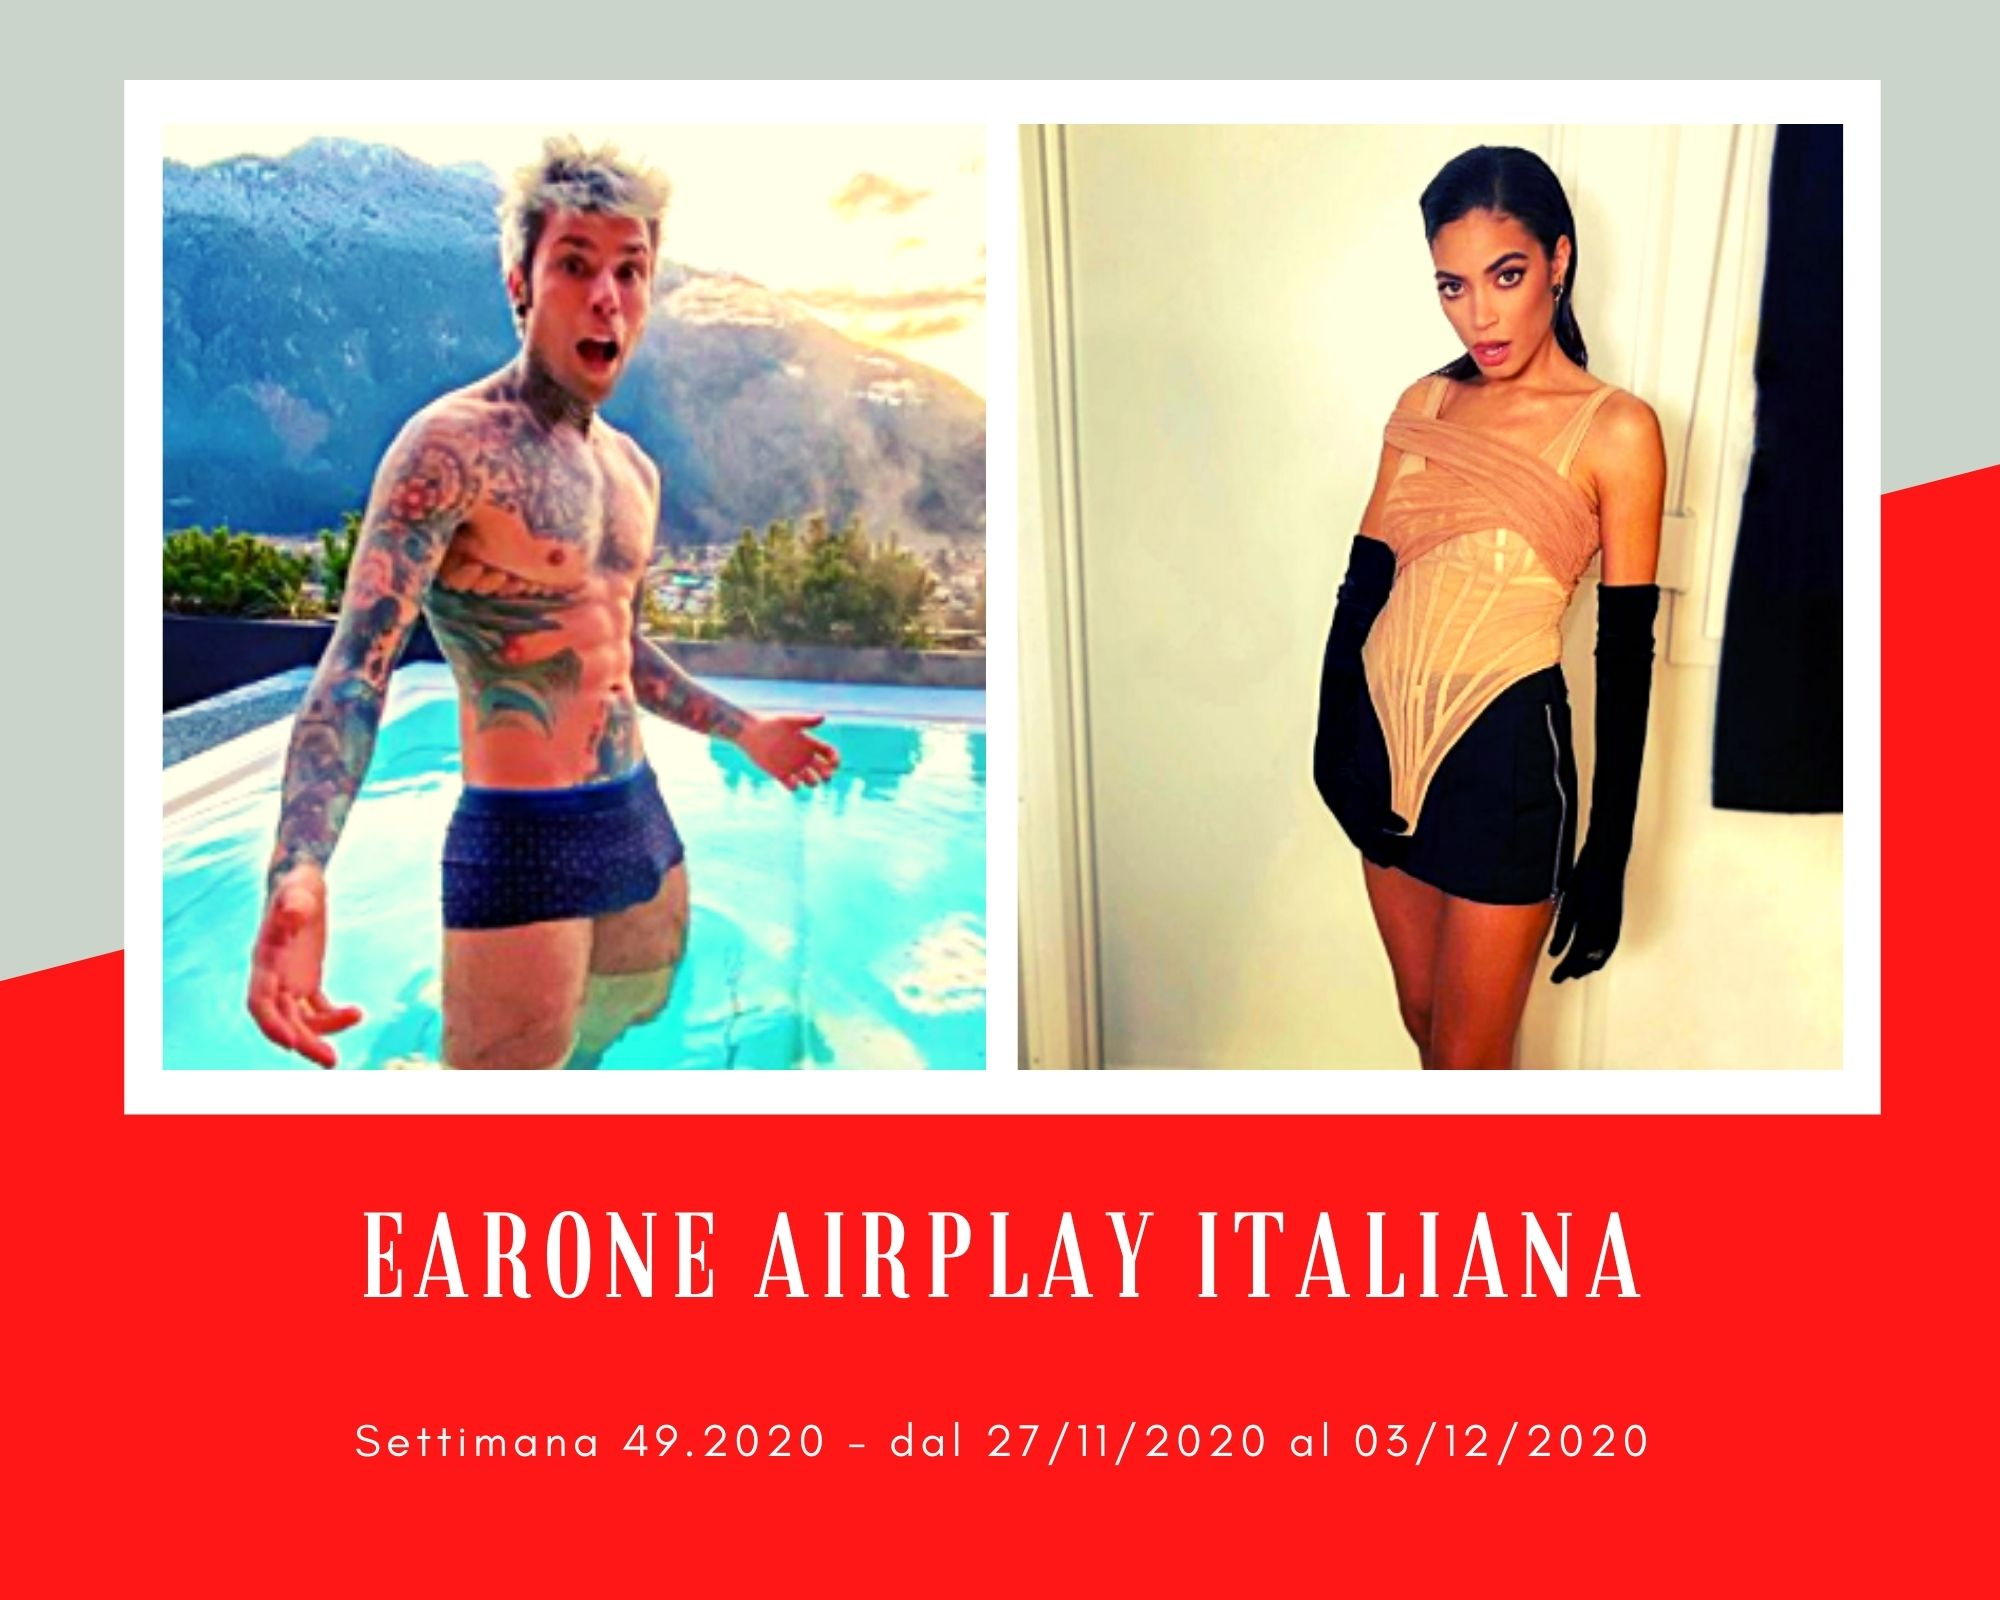 Classifica Radio EARONE Airplay Italiana, week 49. Fedez ritorna in vetta ed Elodie brinda al suo successo